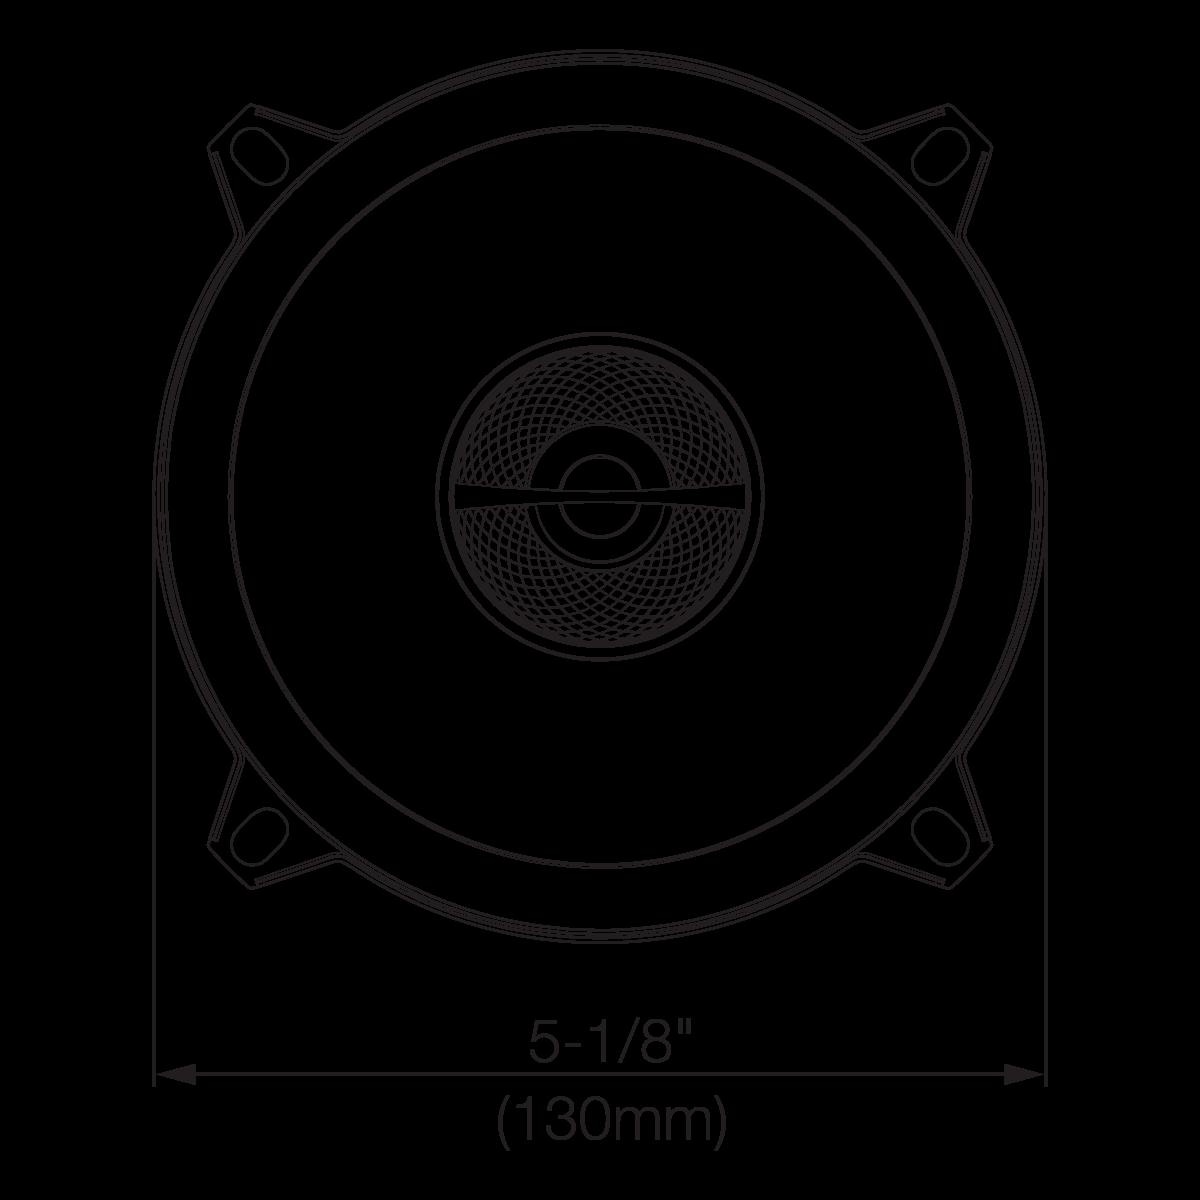 GX502